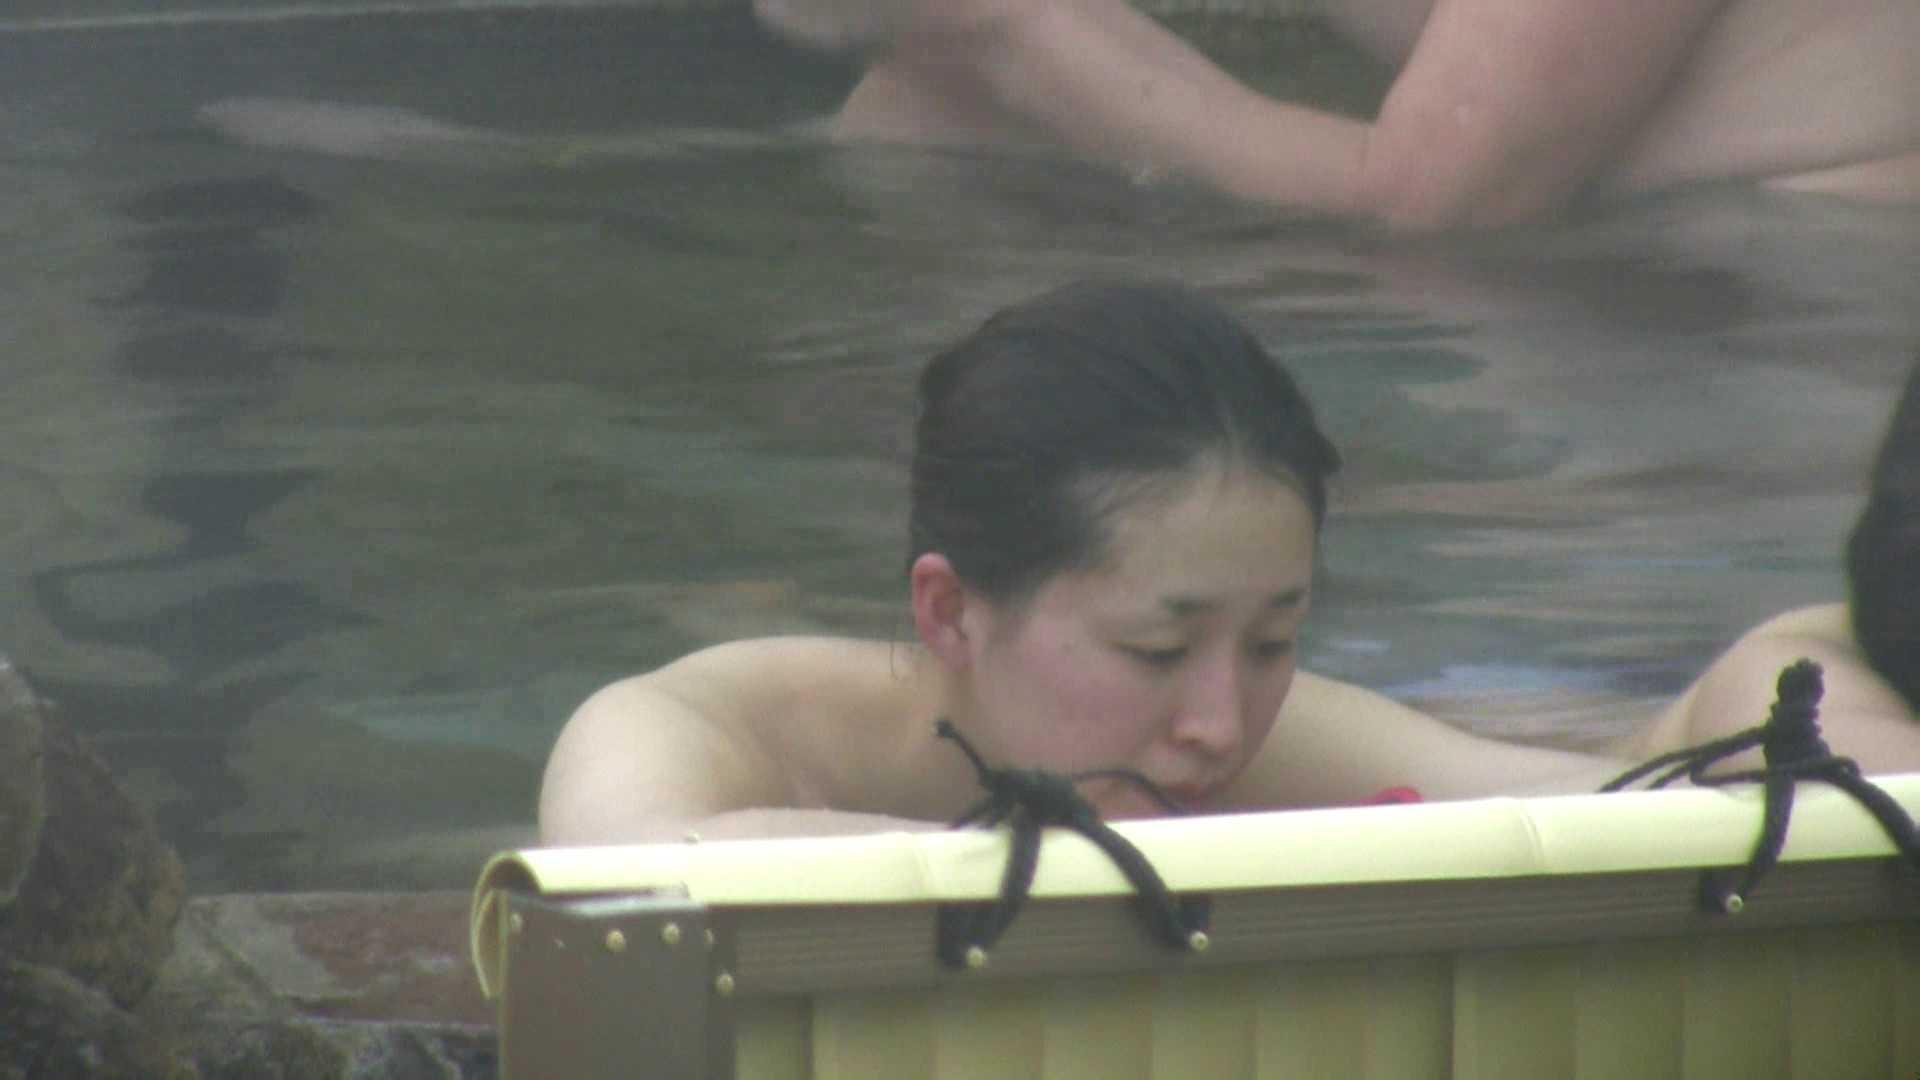 Aquaな露天風呂Vol.583 盗撮 戯れ無修正画像 106枚 77